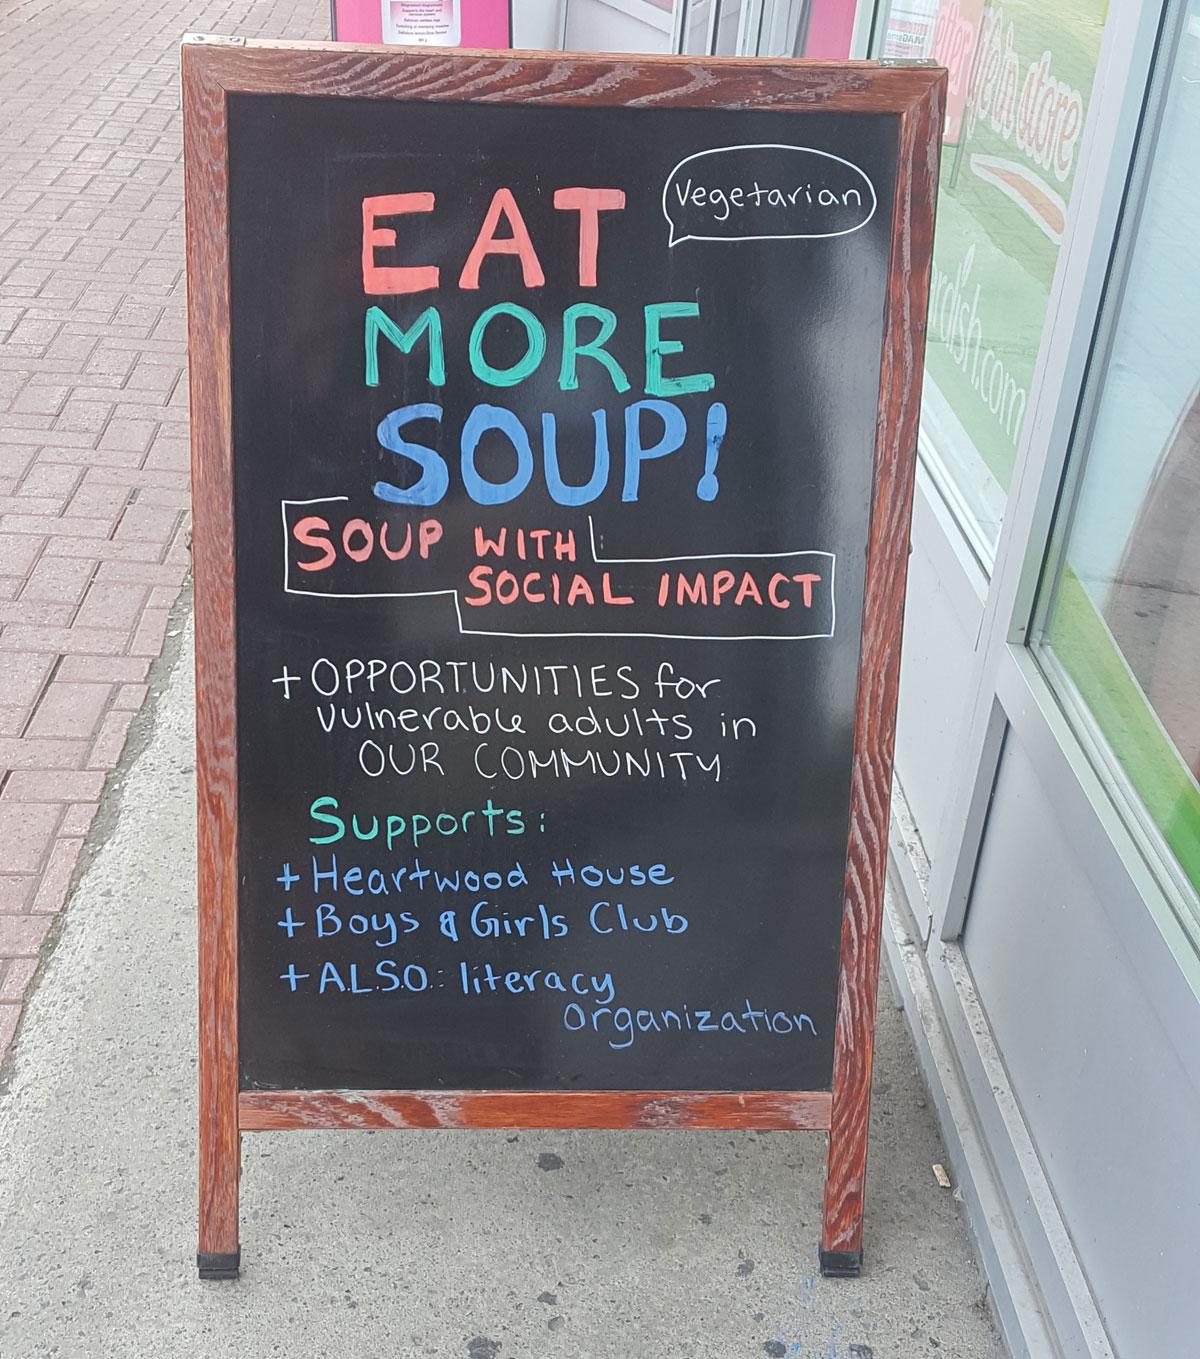 EatMoreSoup---ESDC-eatmoresoup.jpg